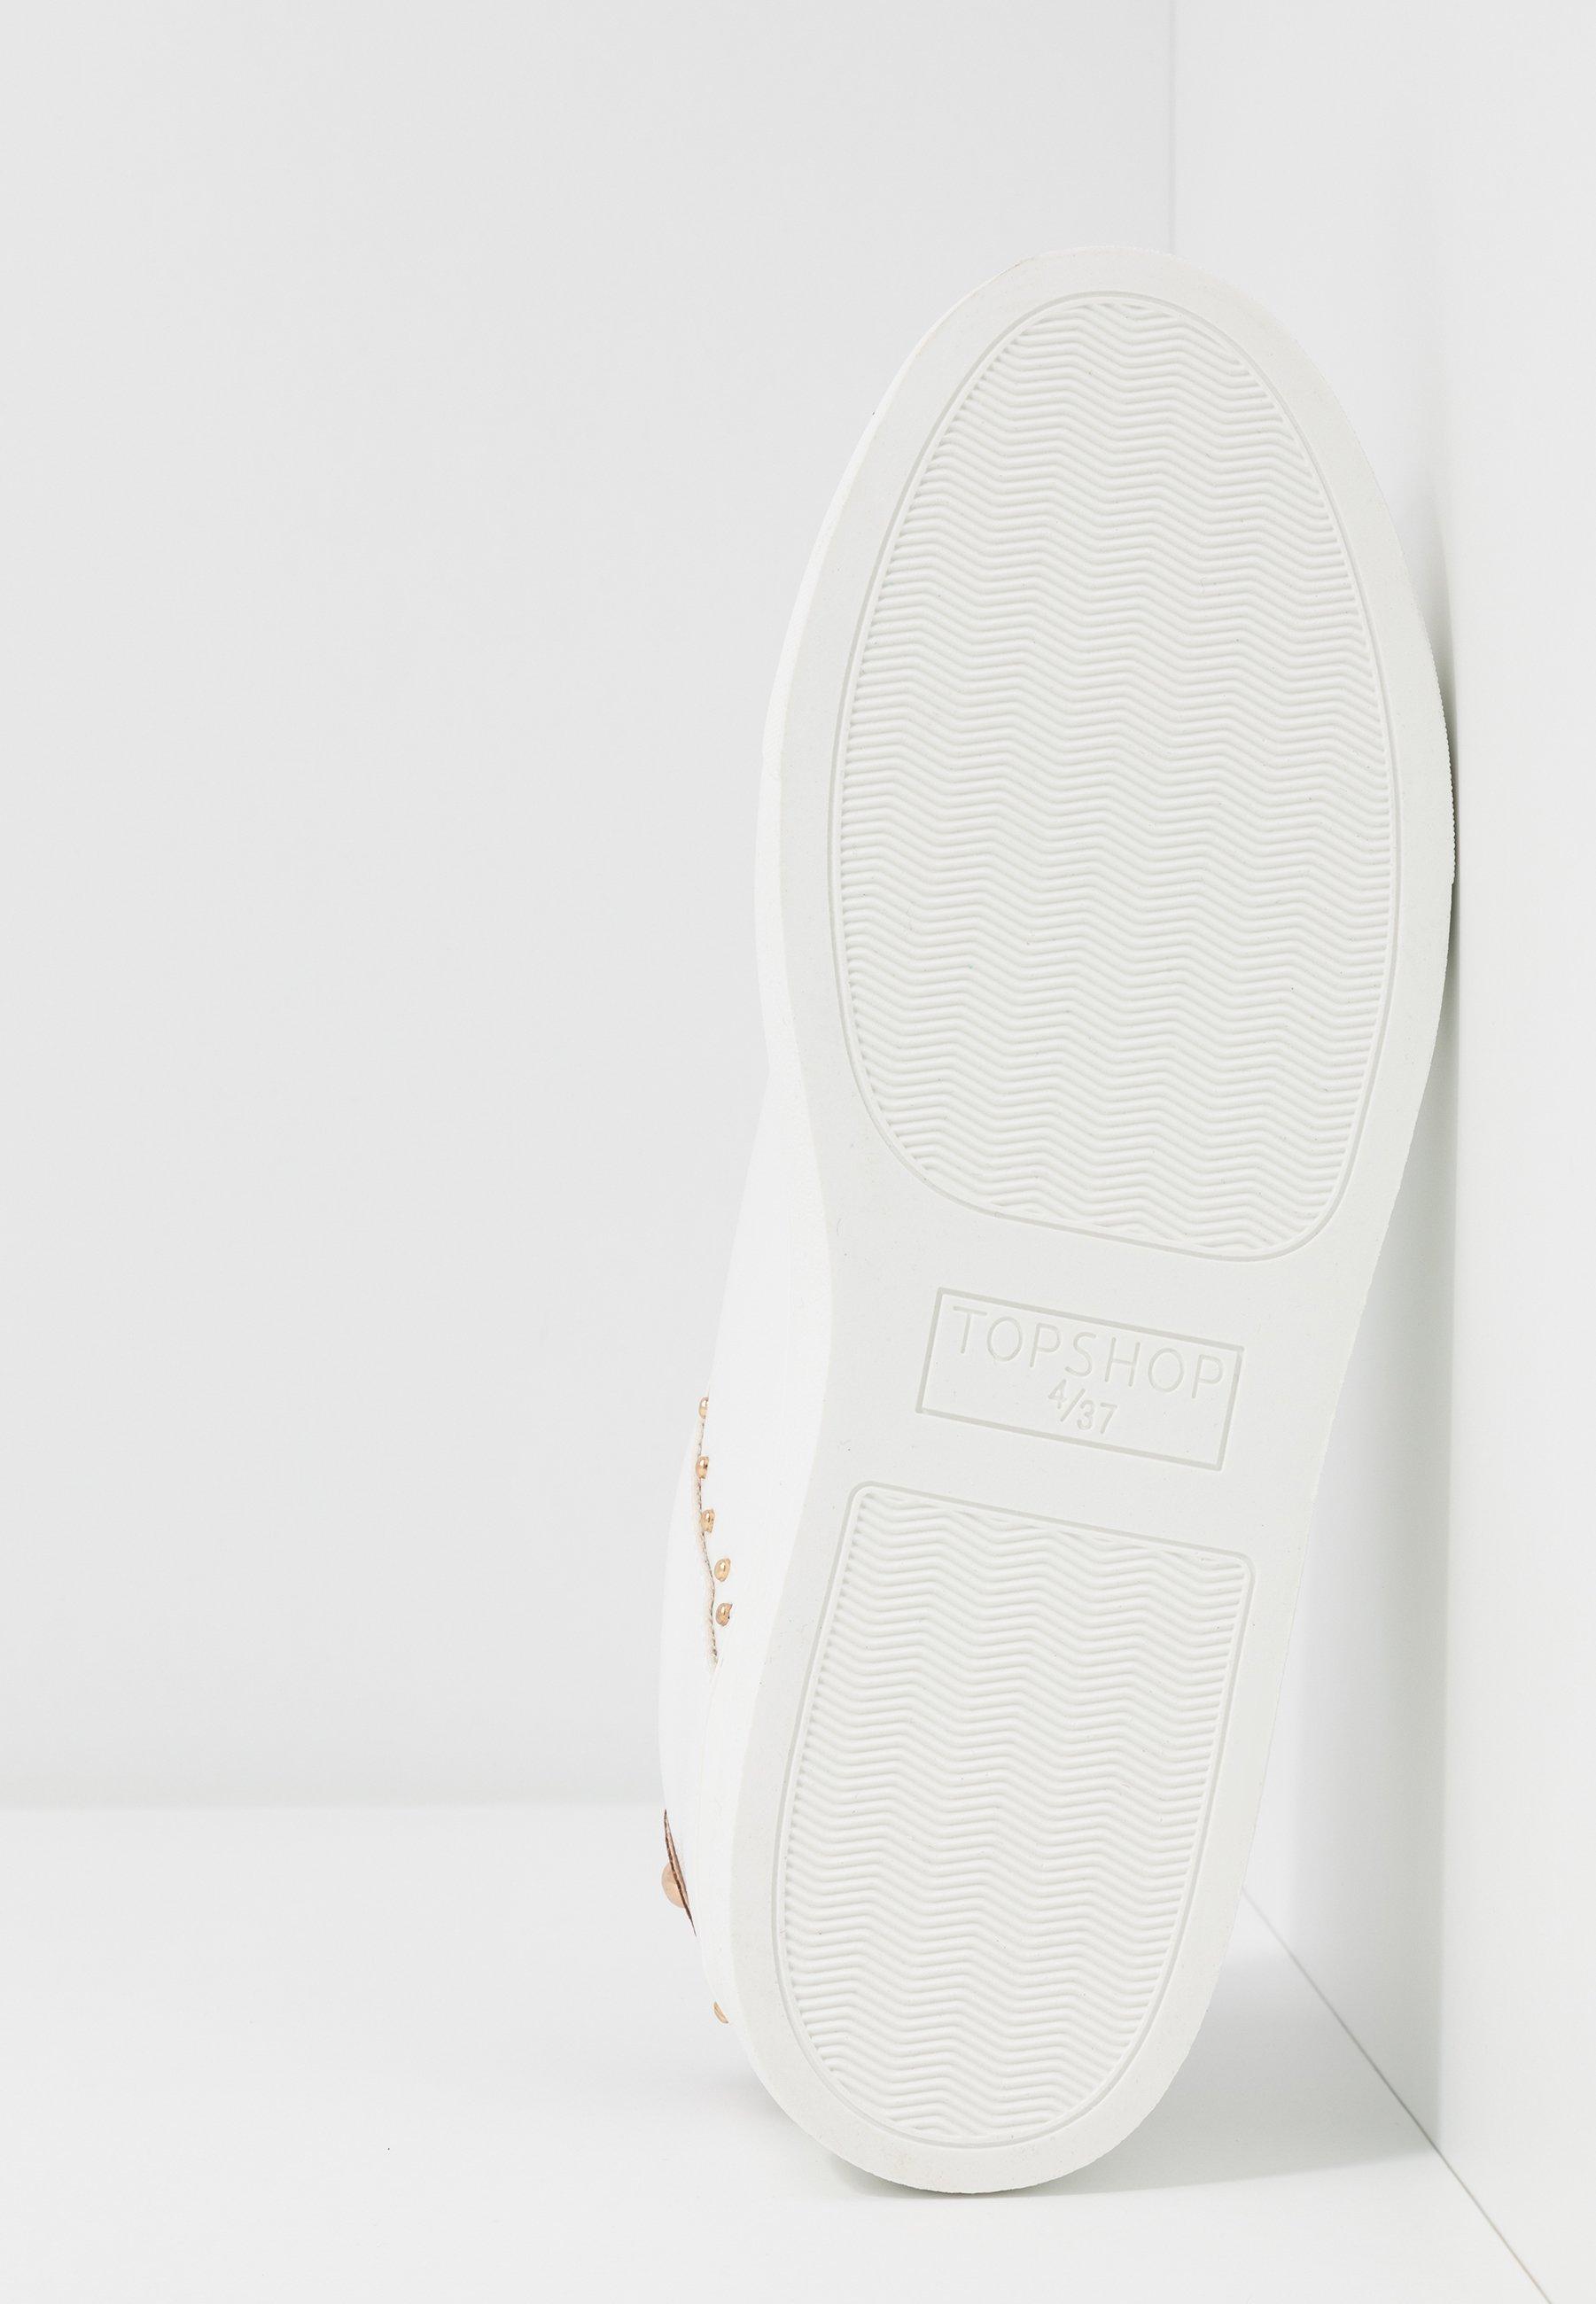 Topshop Cyrus Stud - Sneakers Basse White kAepk